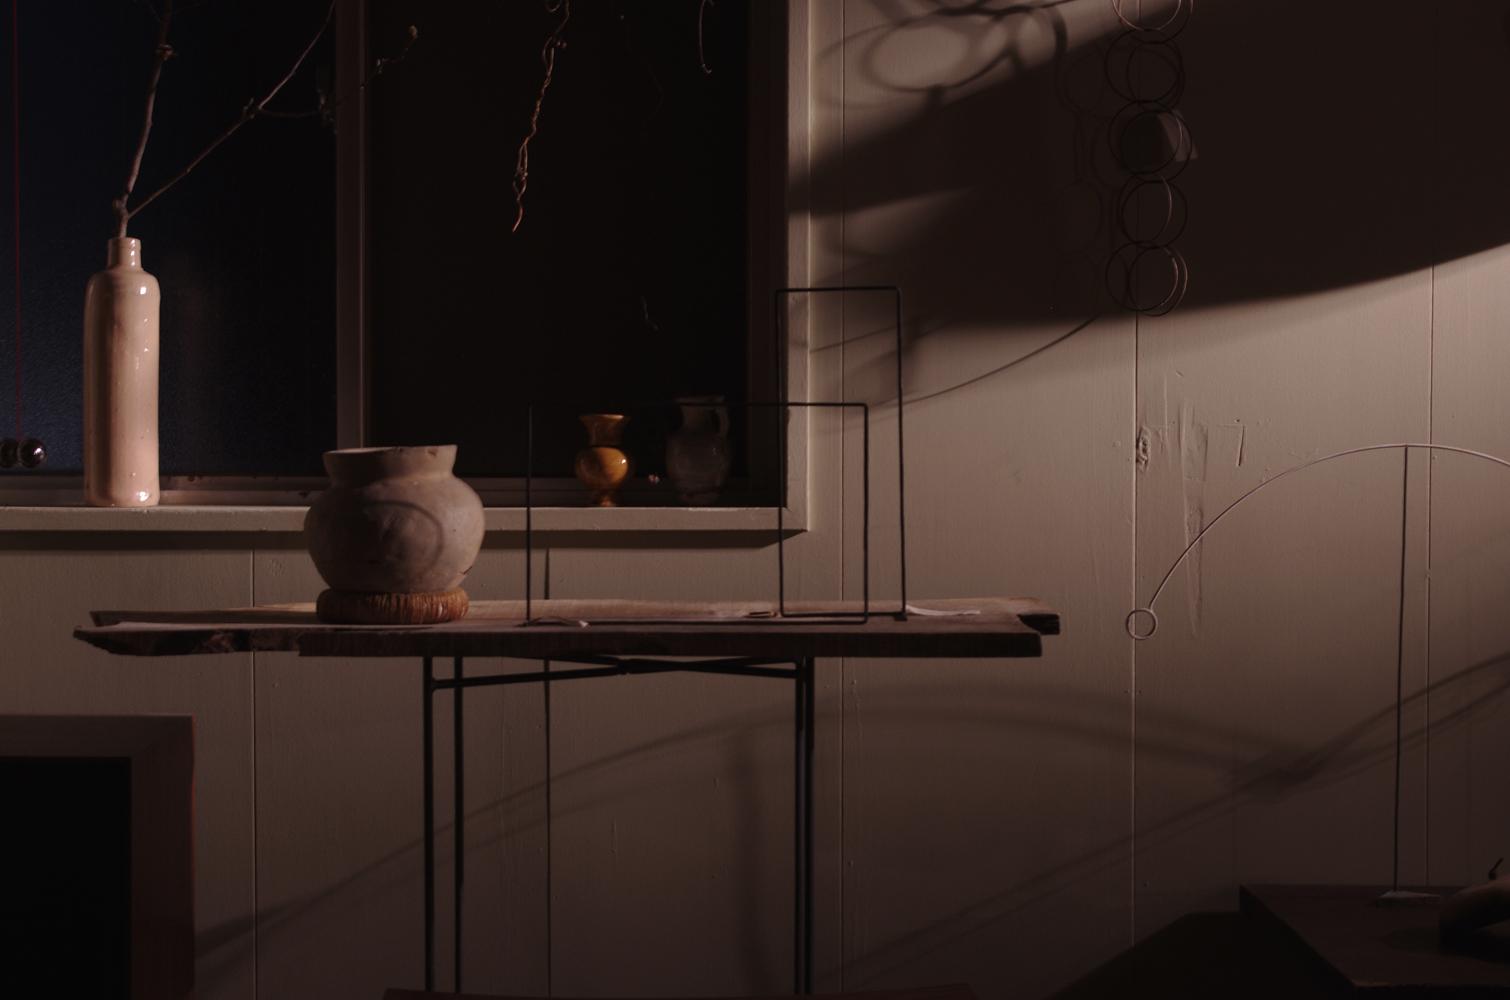 tipura-studio-ironworks-exhibition-24